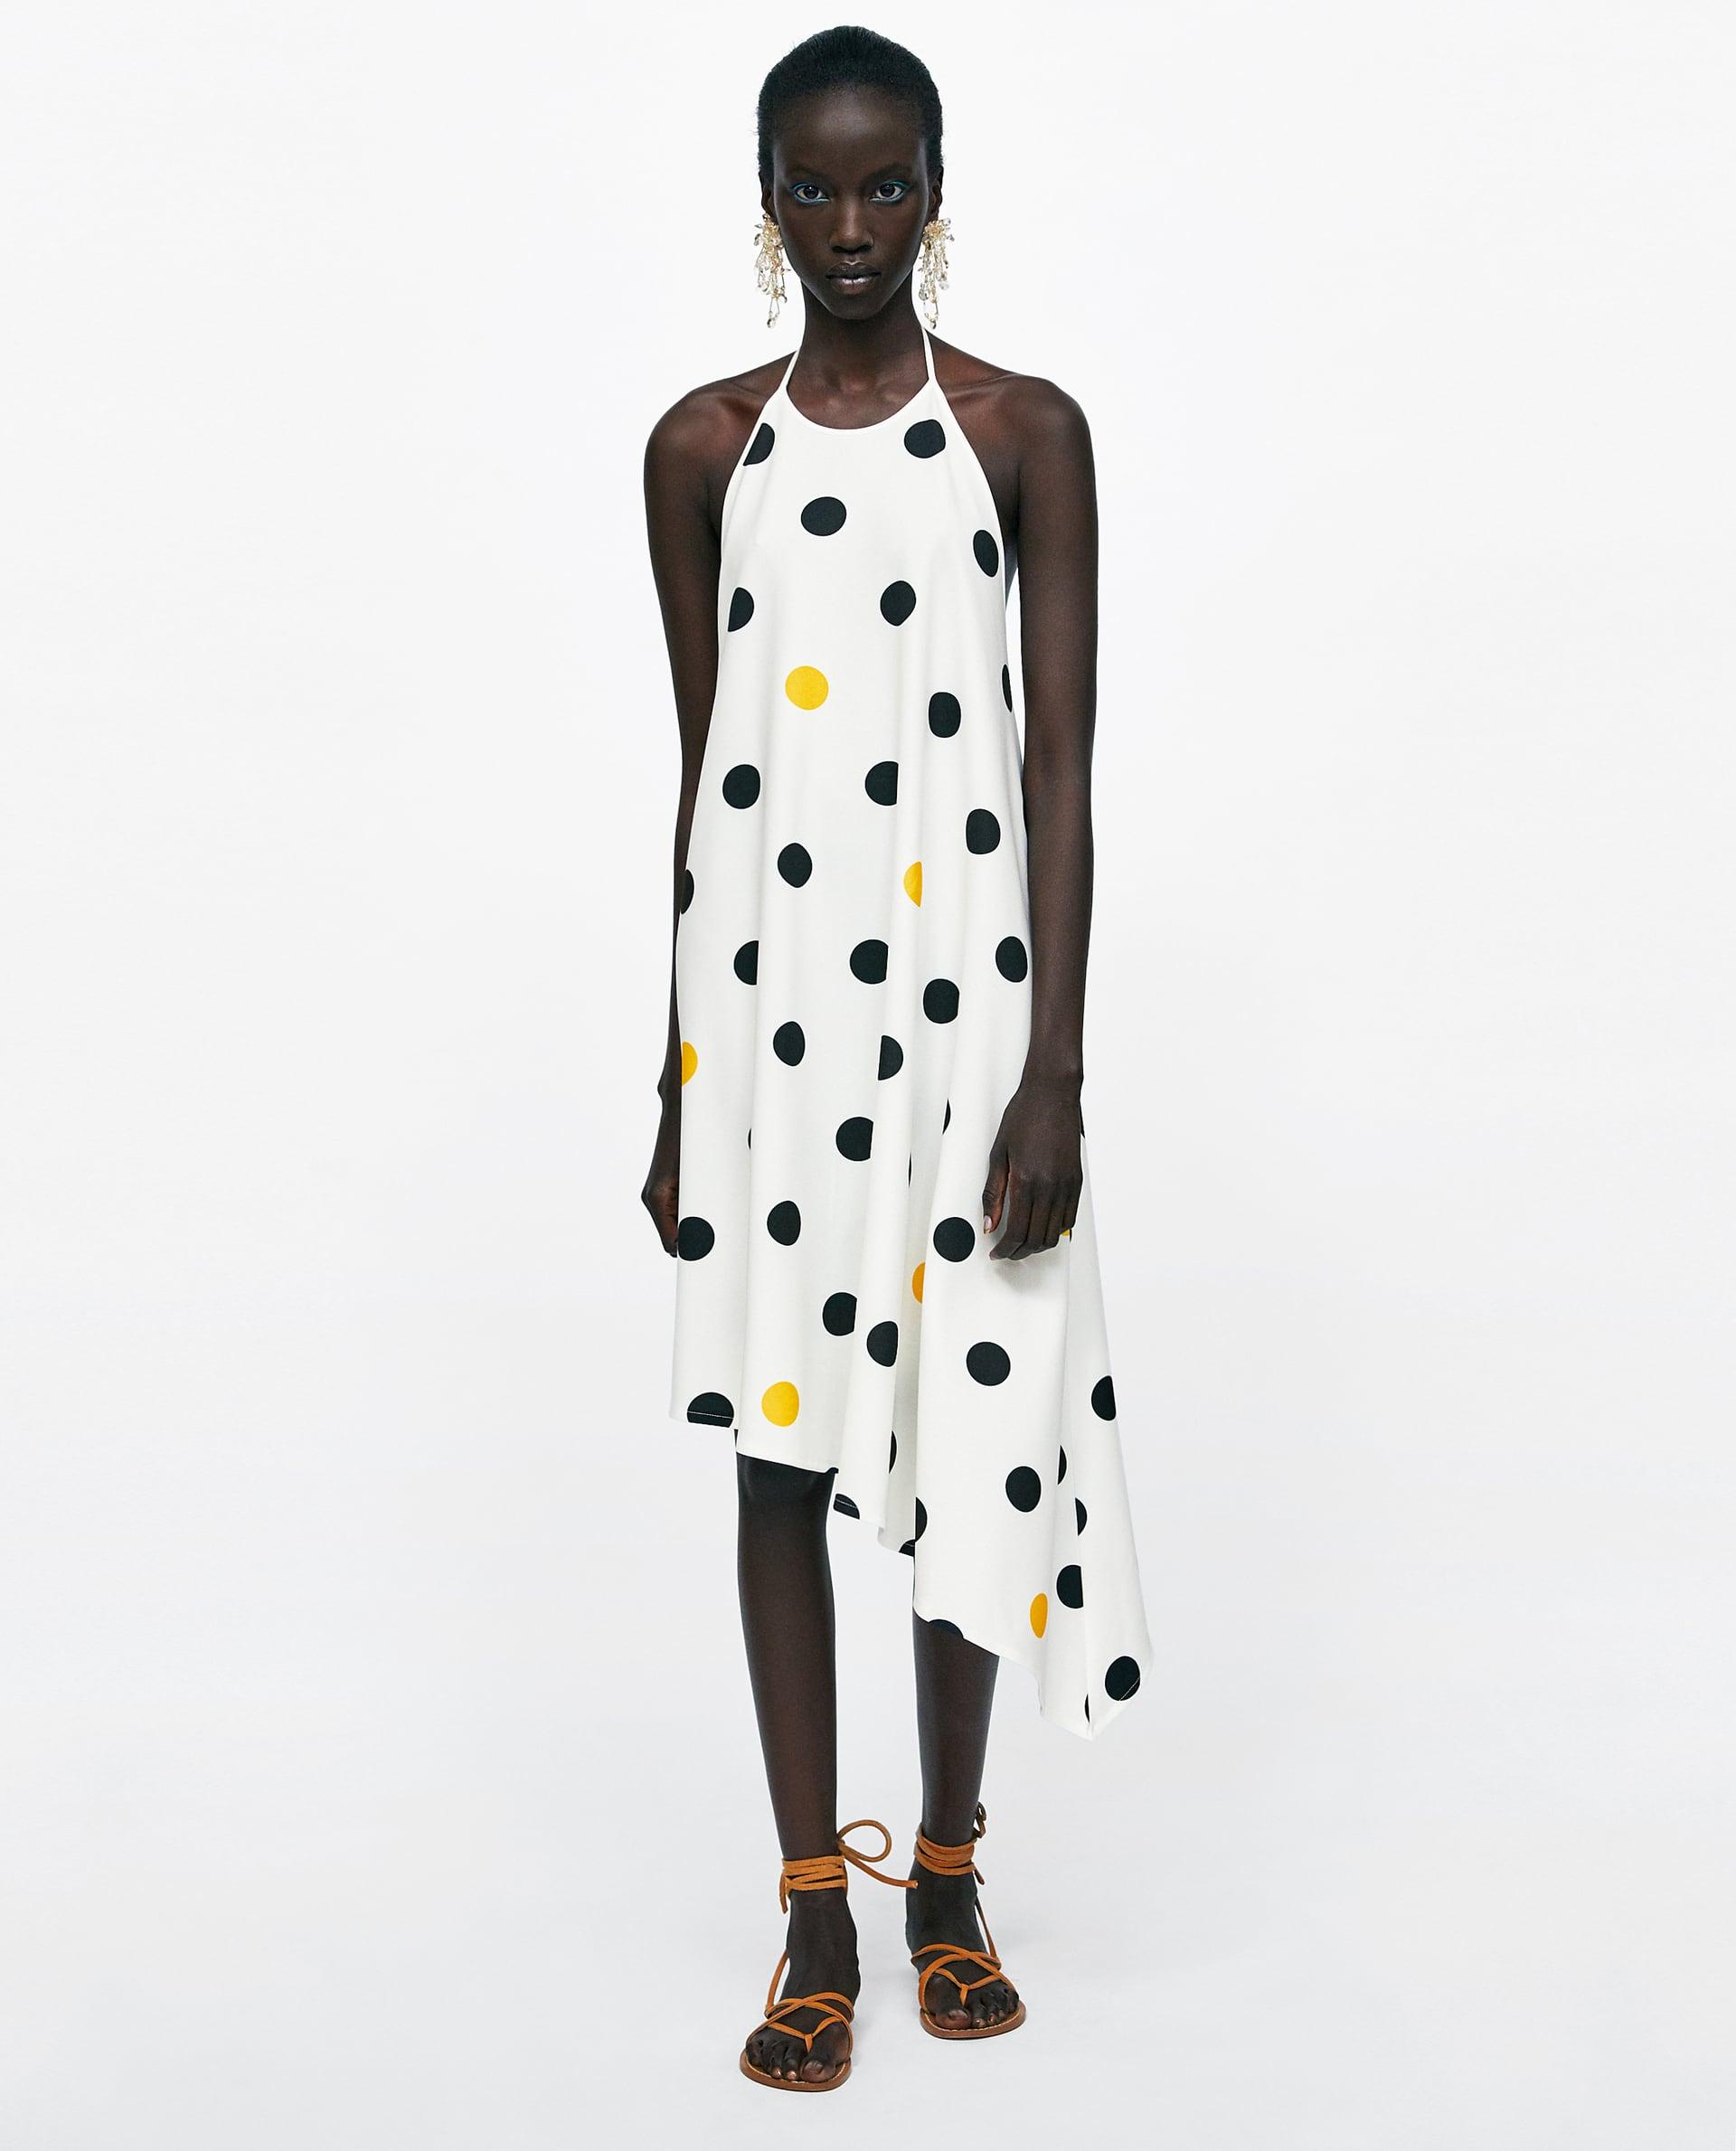 Polka Dot Halterneck Dress - Priced at £25.99, available at Zara